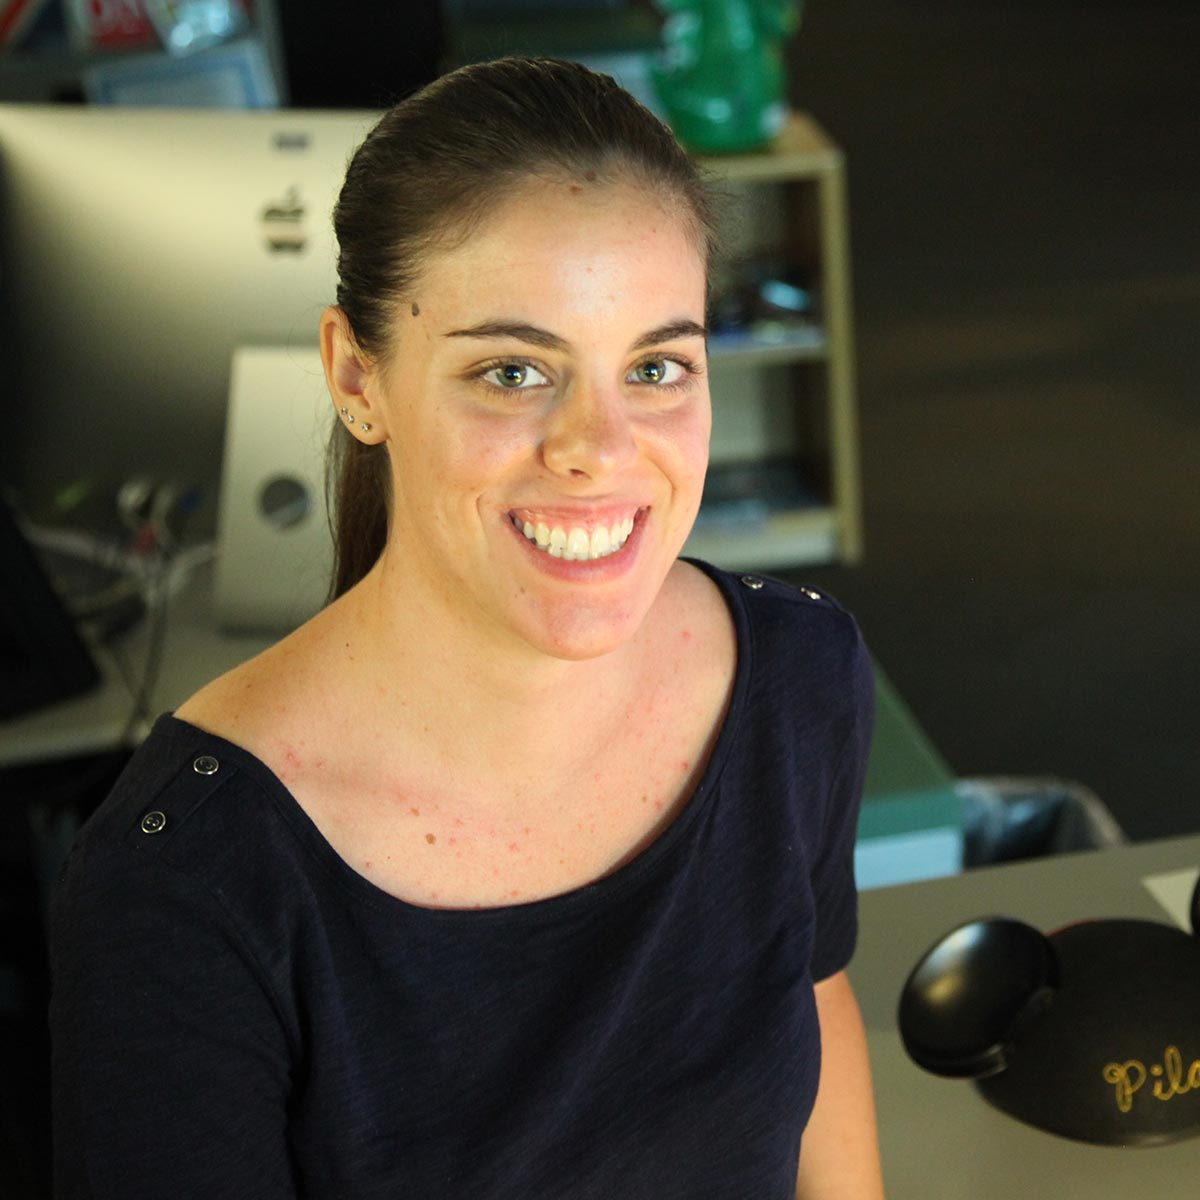 Pilar Molina Lopez